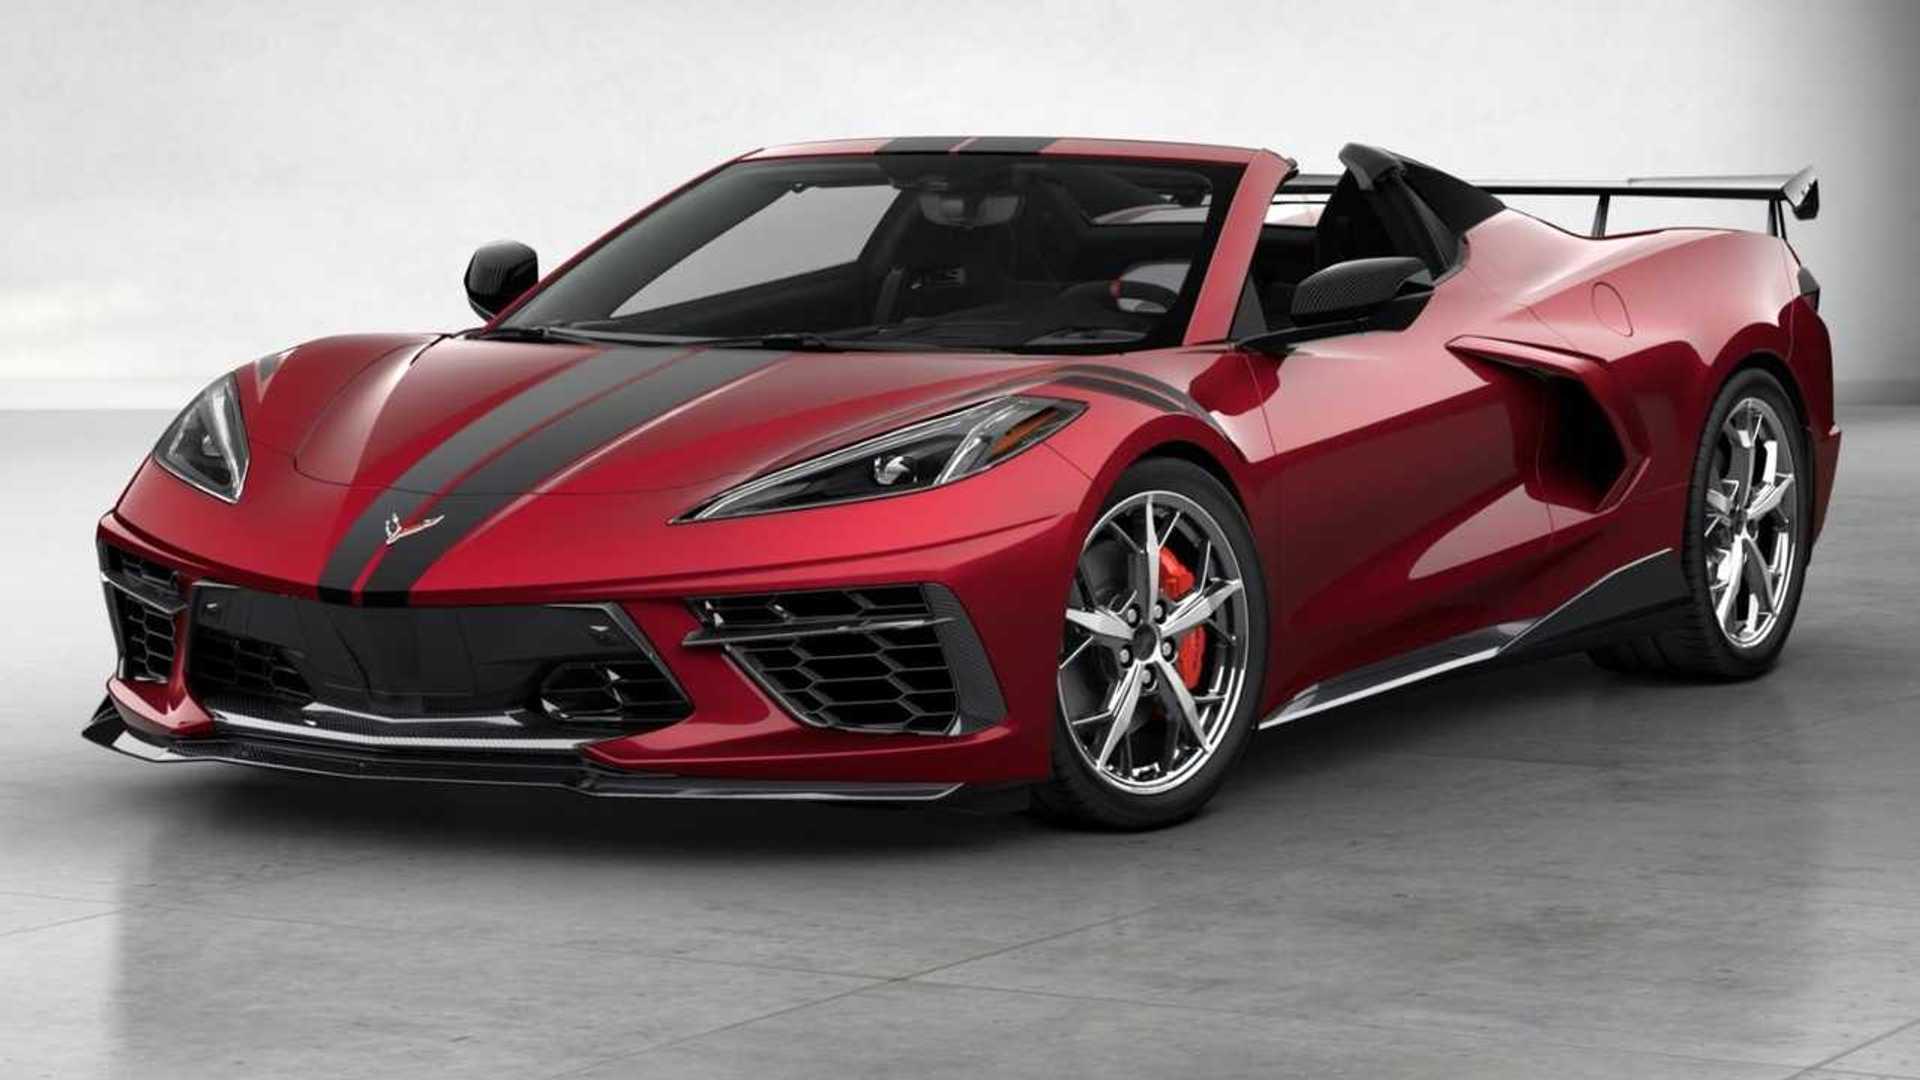 GM Loses Money On Every 2020 Corvette Under $80,000